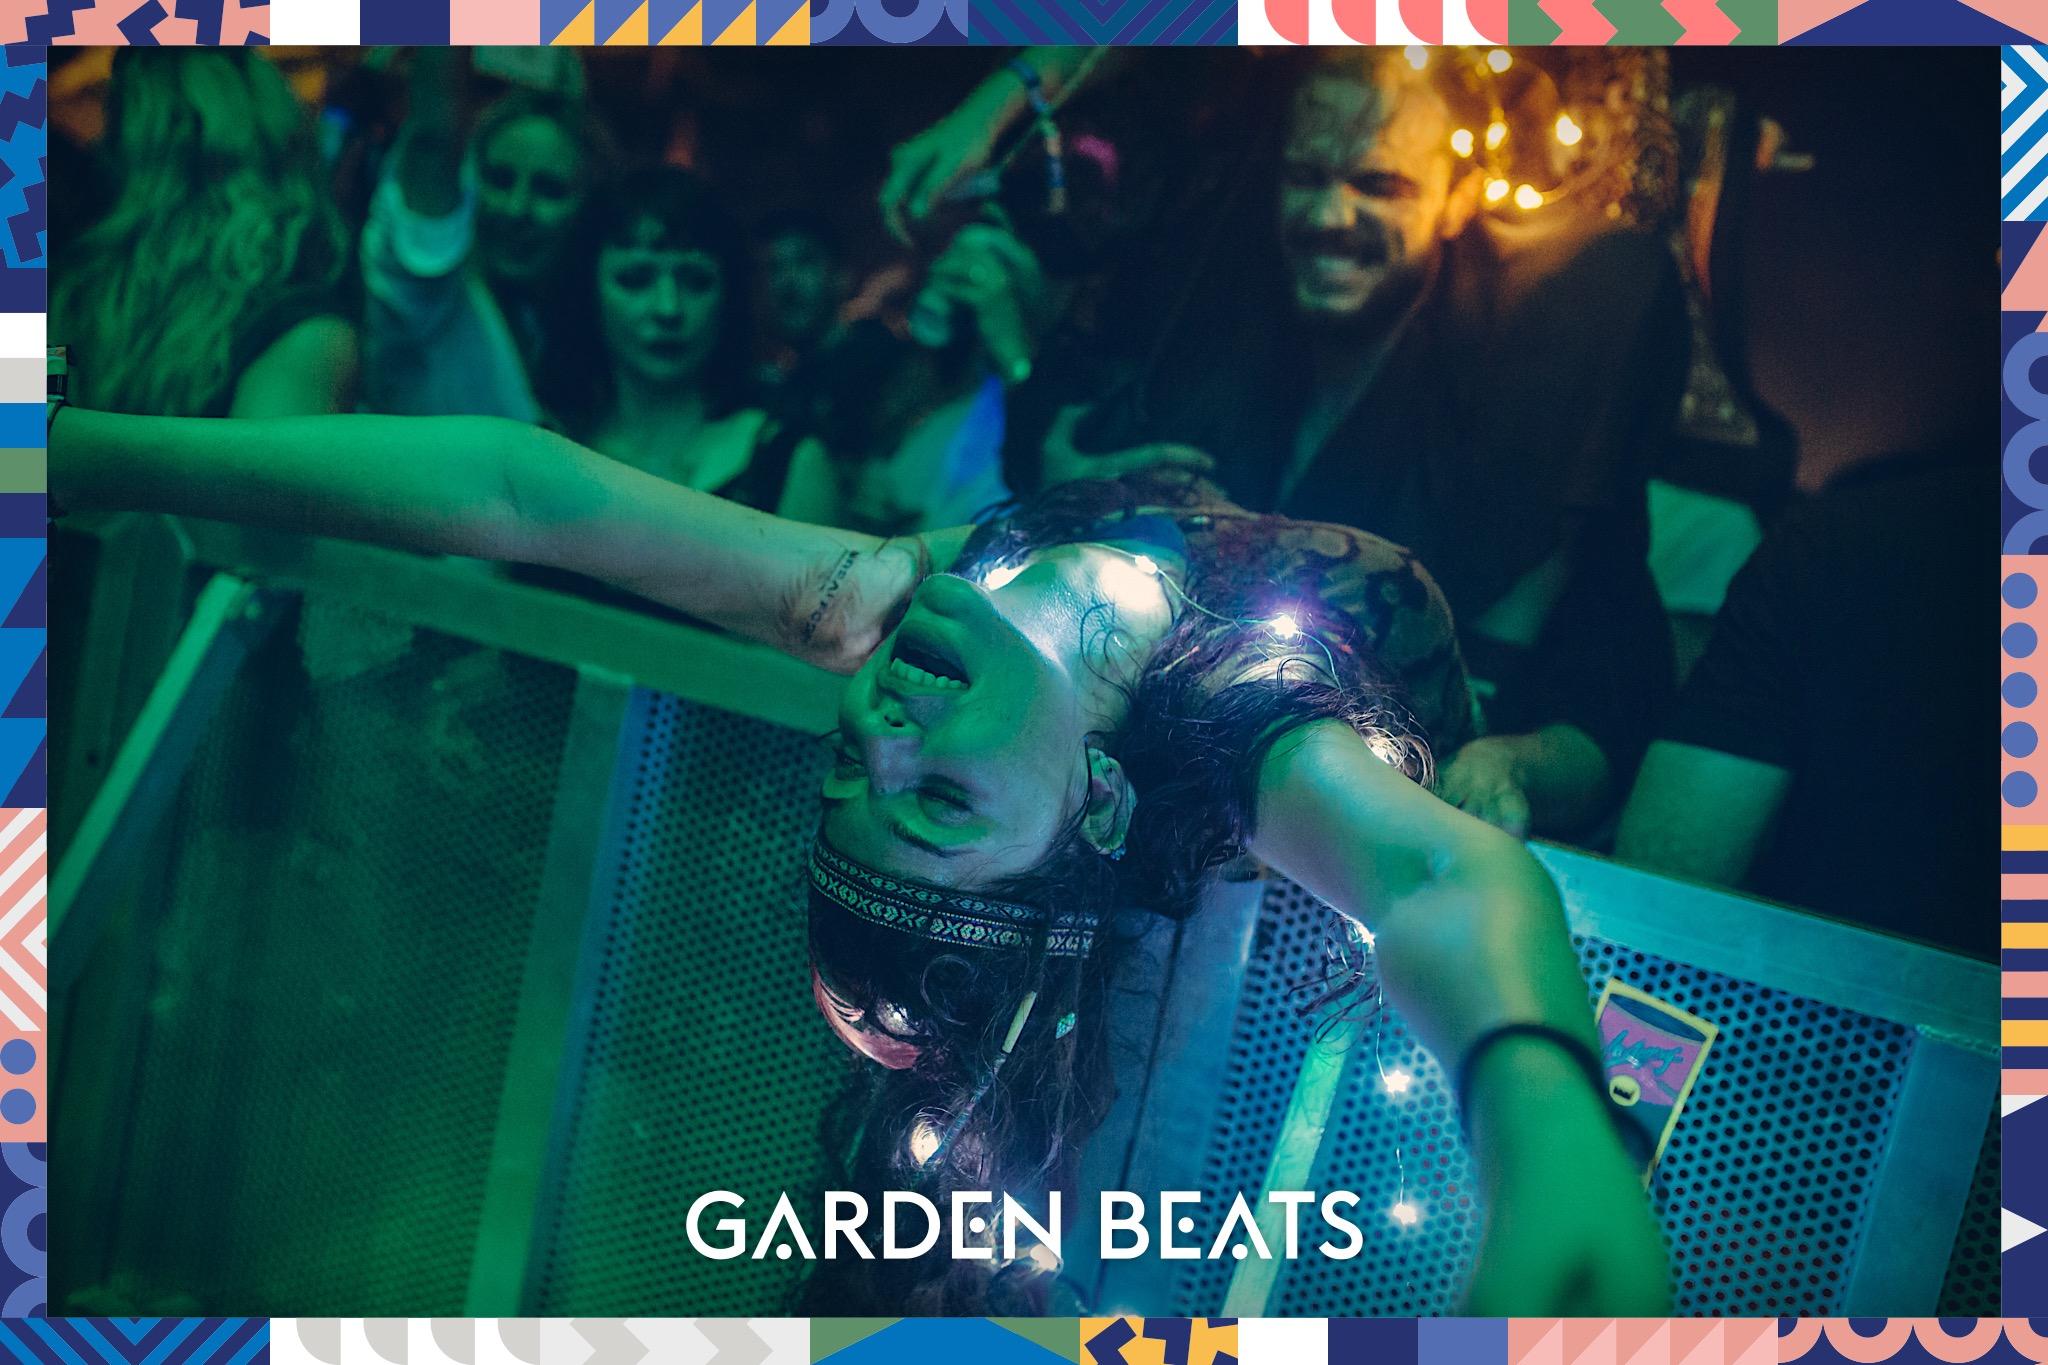 18032017_GardenBeats_Colossal897_WatermarkedGB.jpg